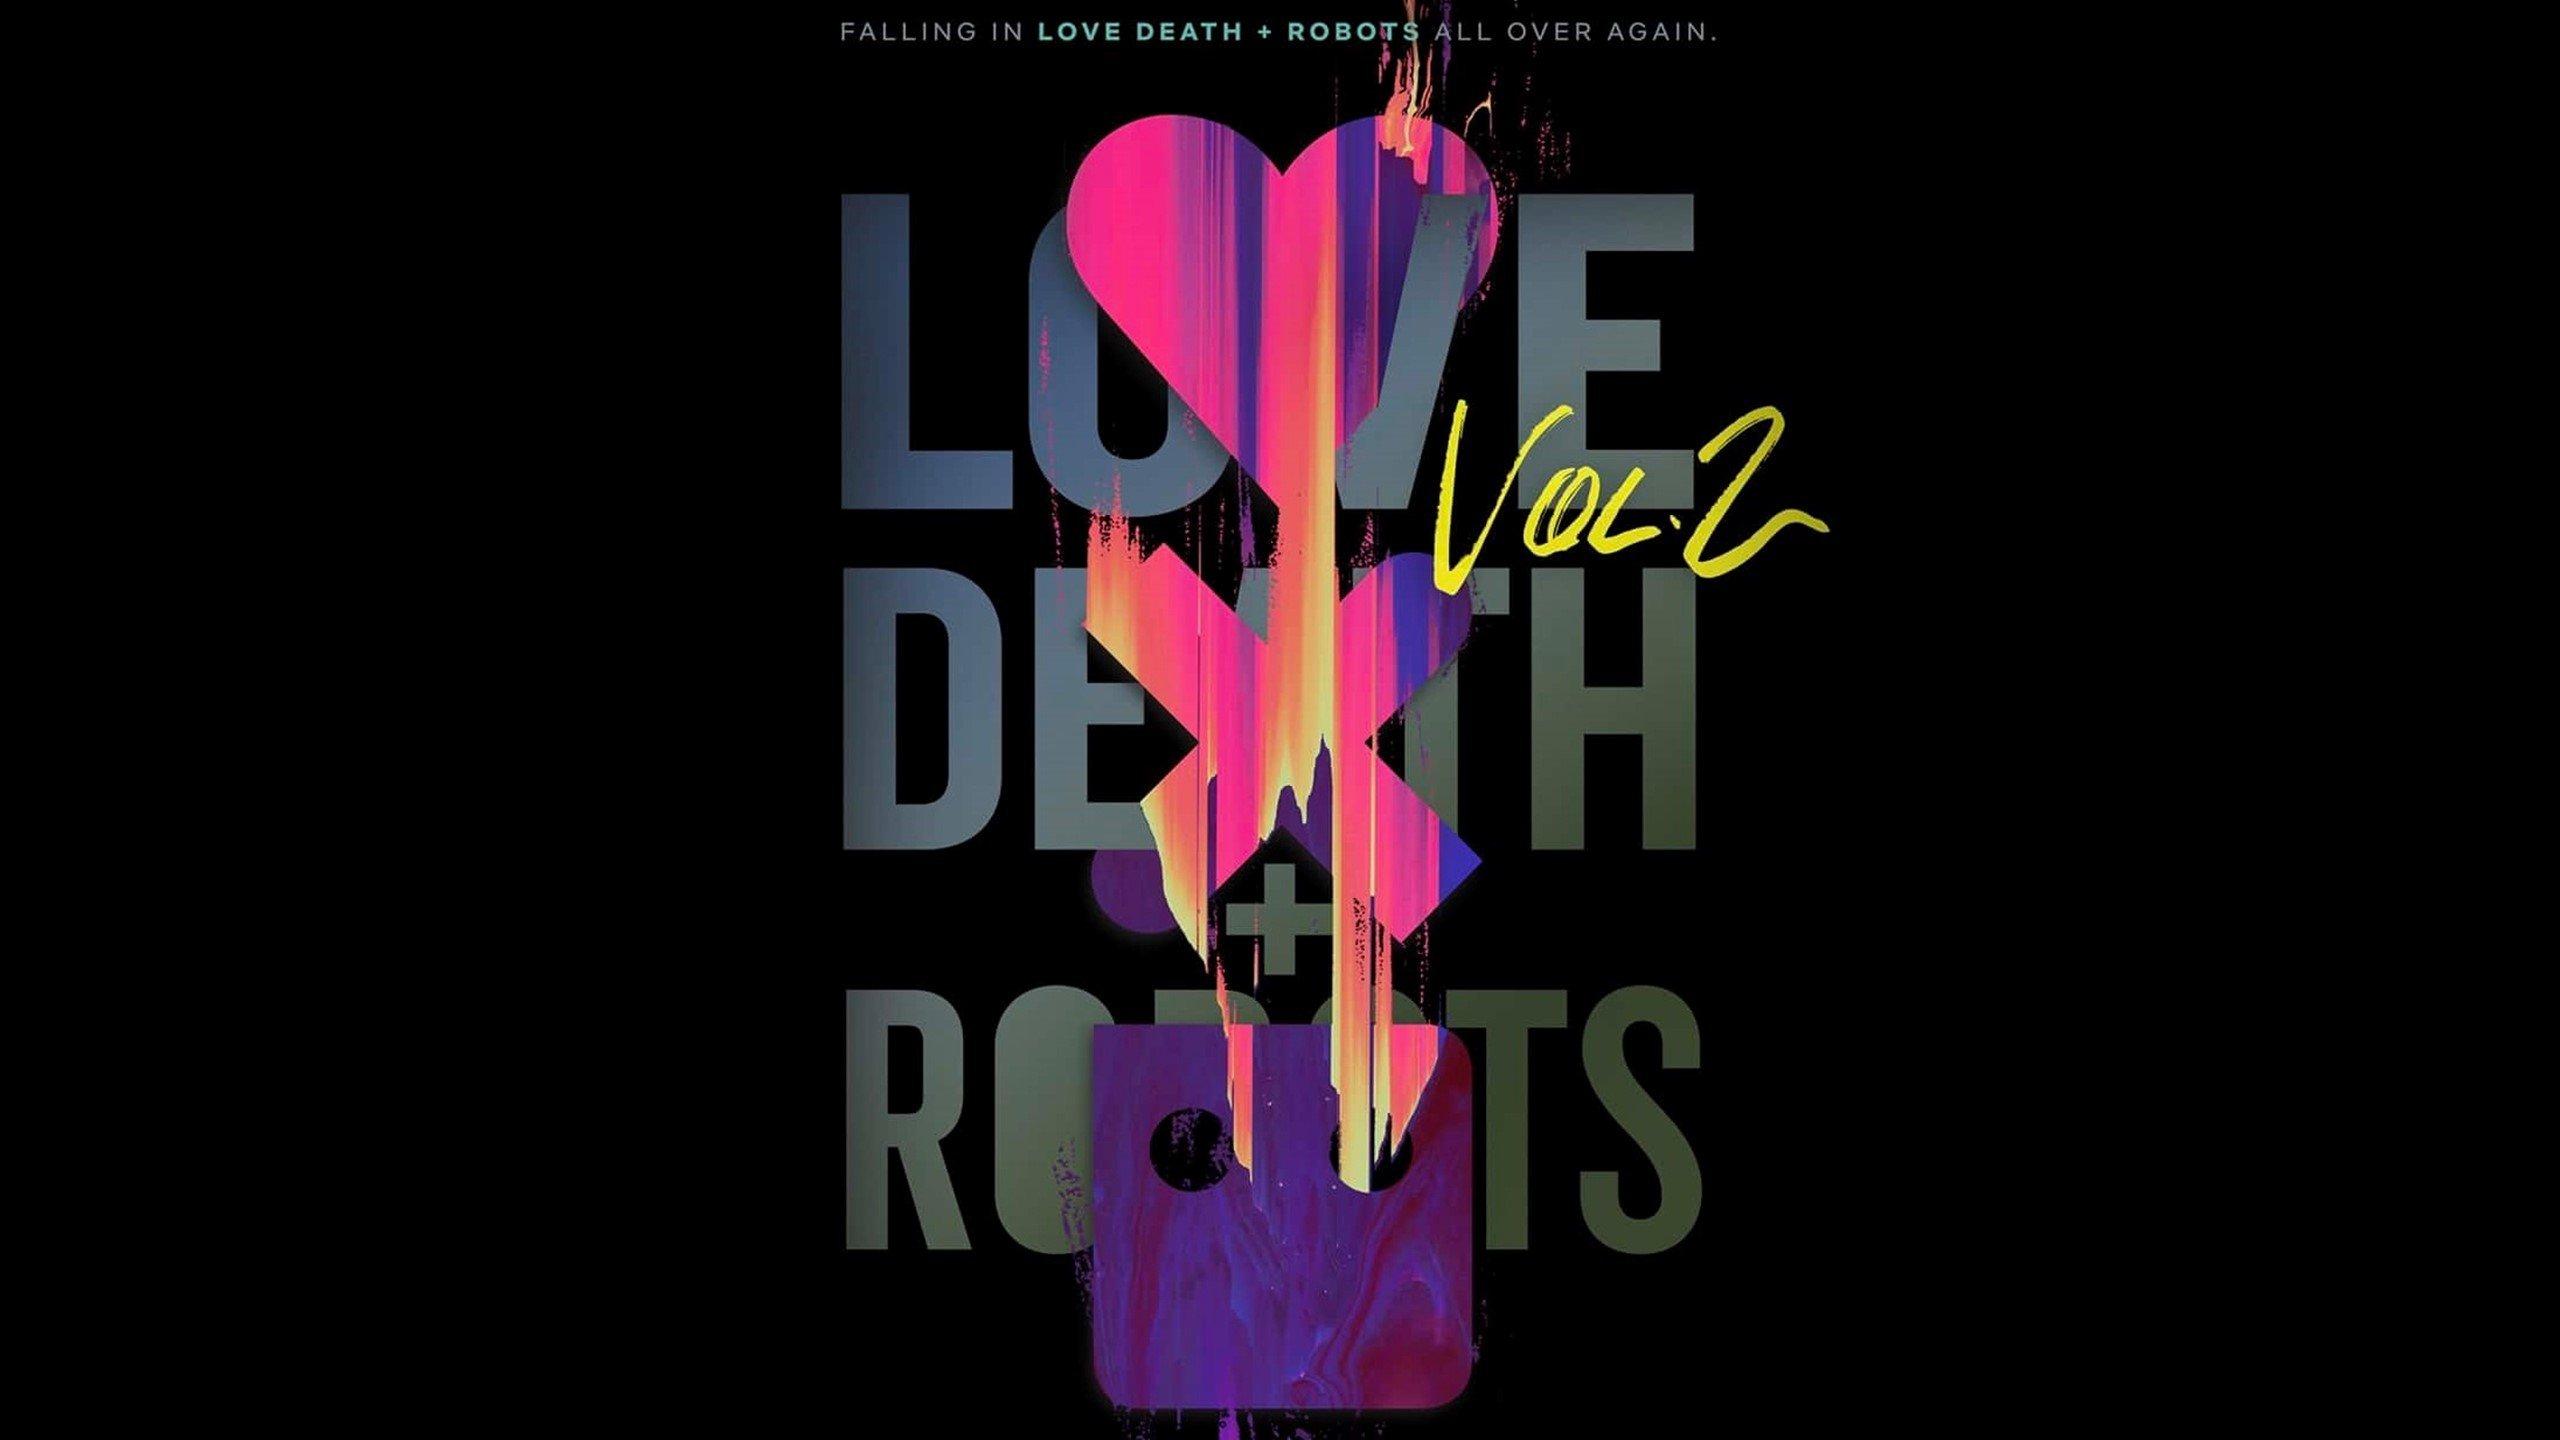 love-death-robots-2-poster